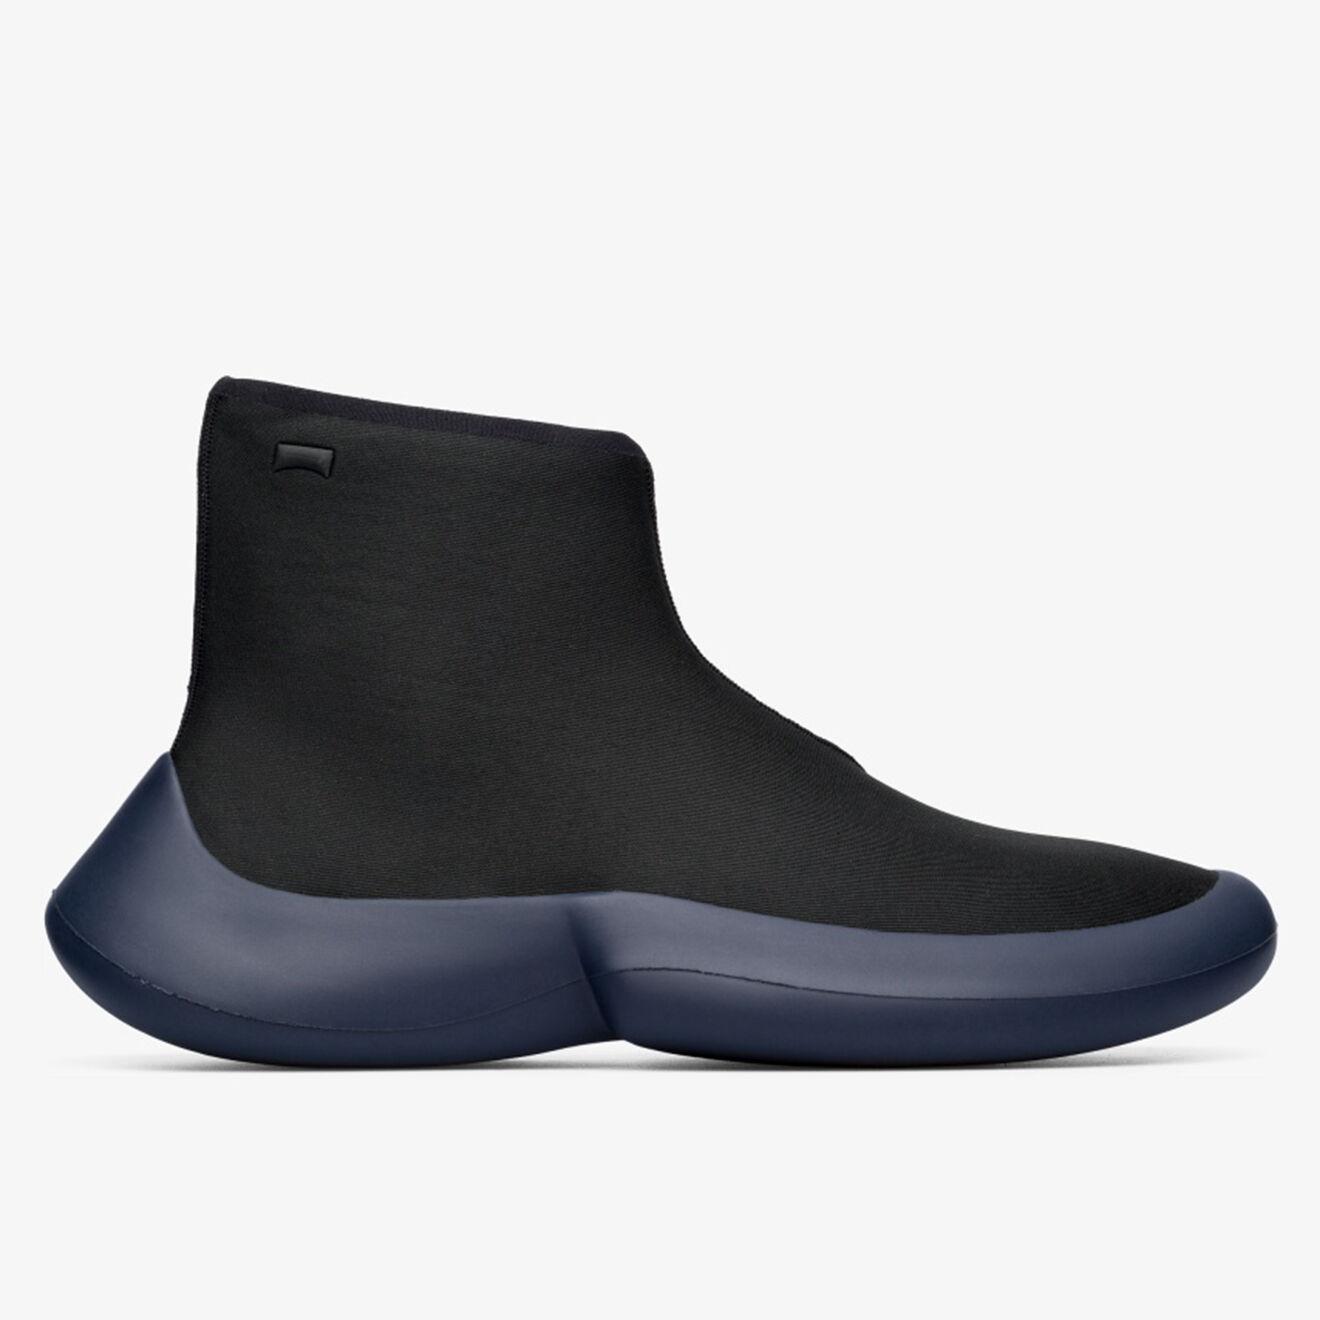 Baskets montantes ABS noires - Camper - Modalova